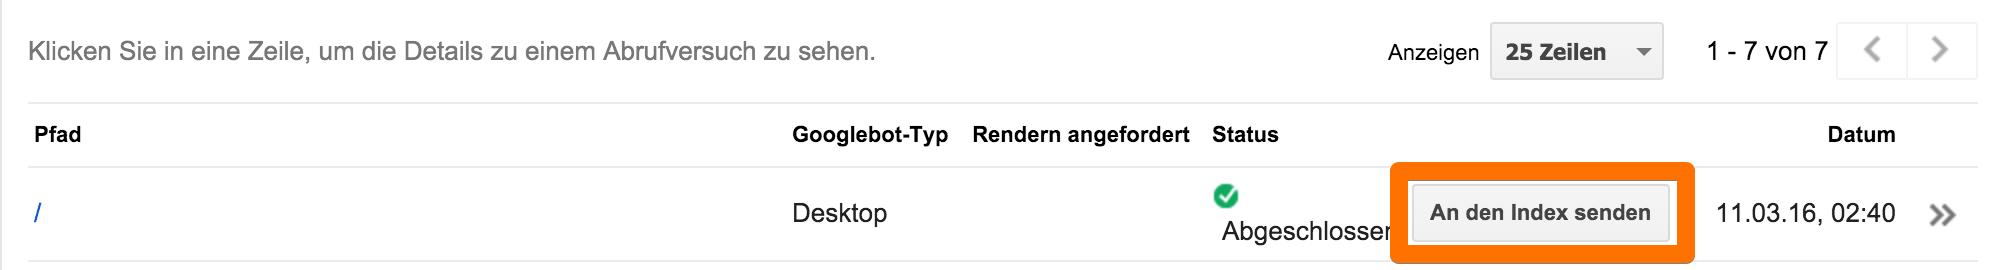 121watt-abruf-google-bot-senden